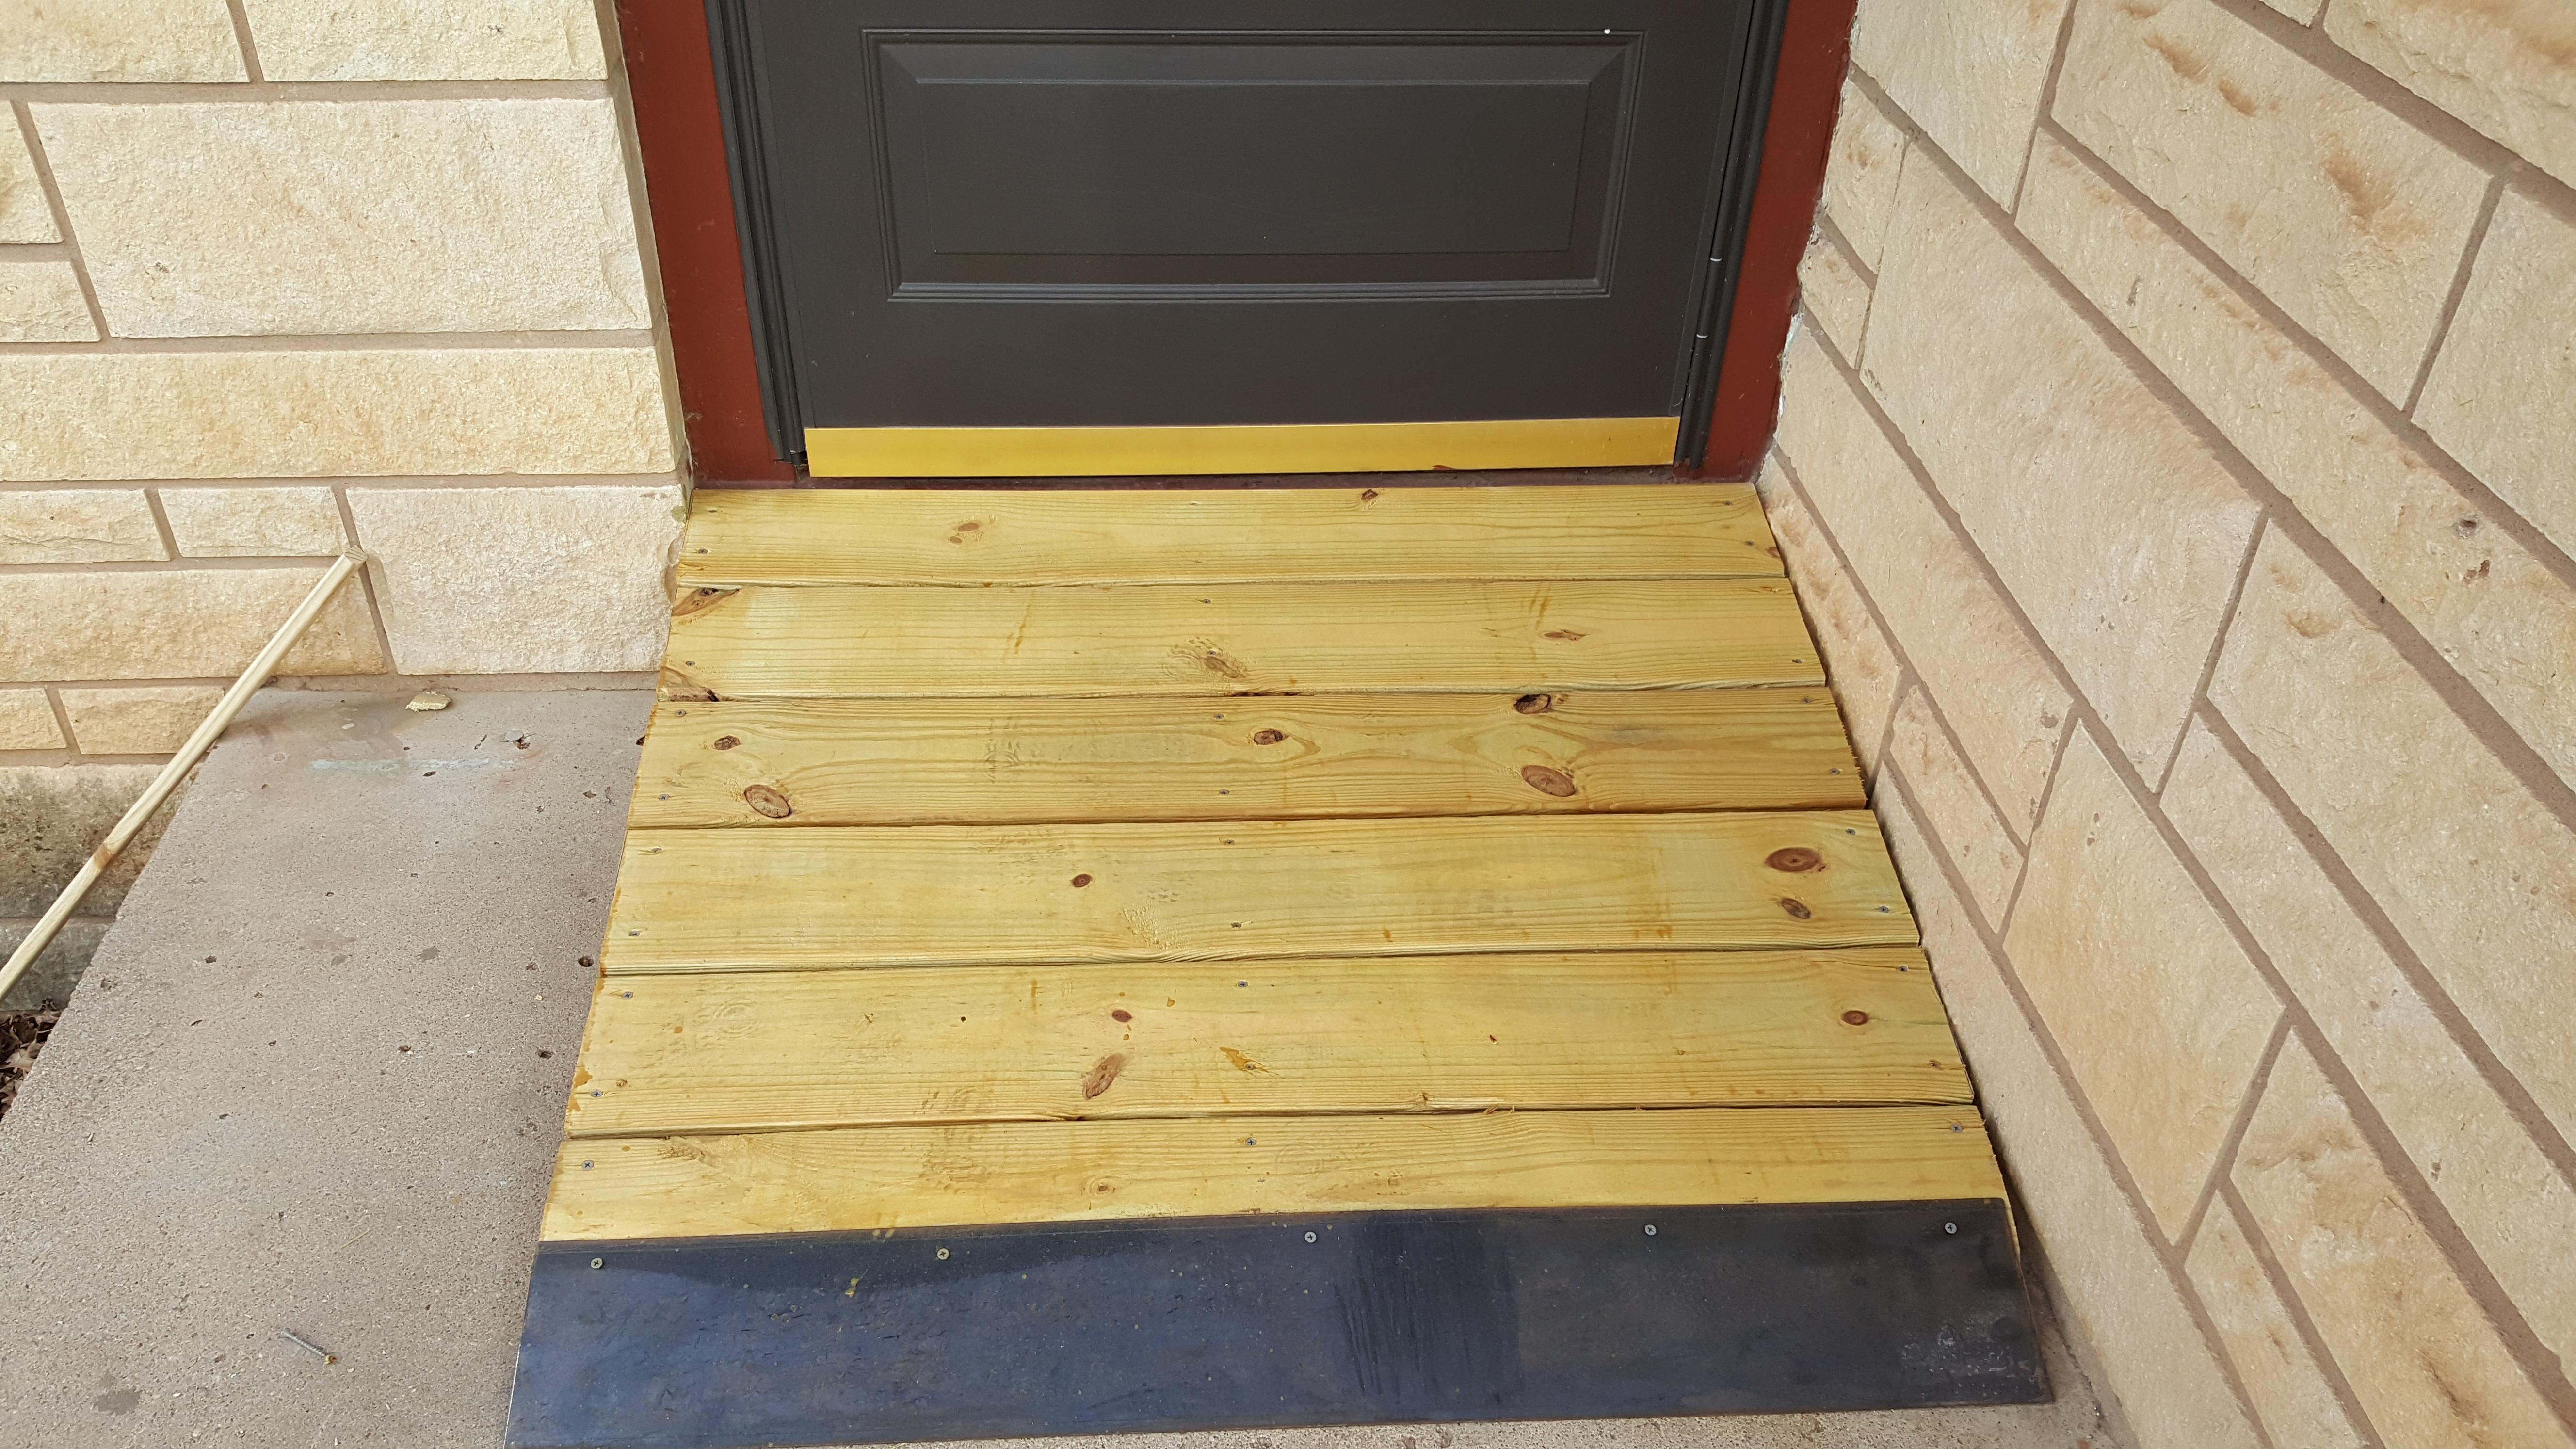 Best 18 Star Lumber And Supply Wichita Ks Wallpaper Cool Hd